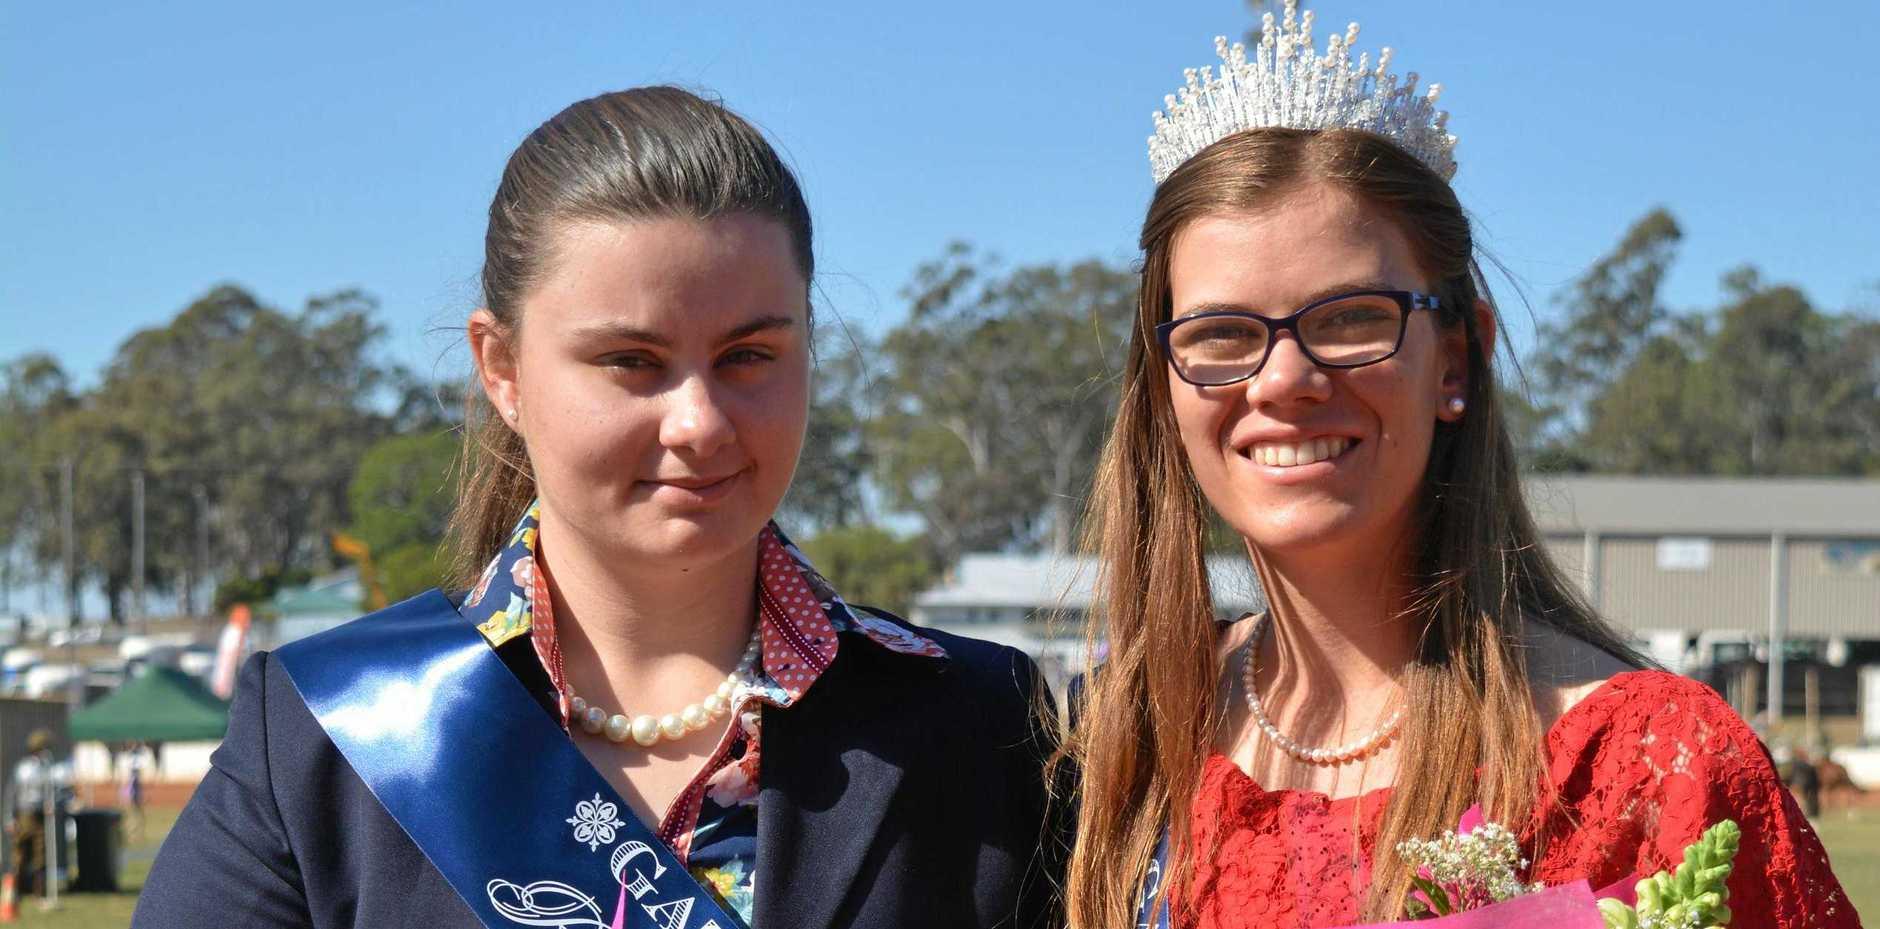 GATTON SHOW: Gatton's 2019 Rural Ambassador Tenneal Prebble and Miss Show Girl Sarah Rose.